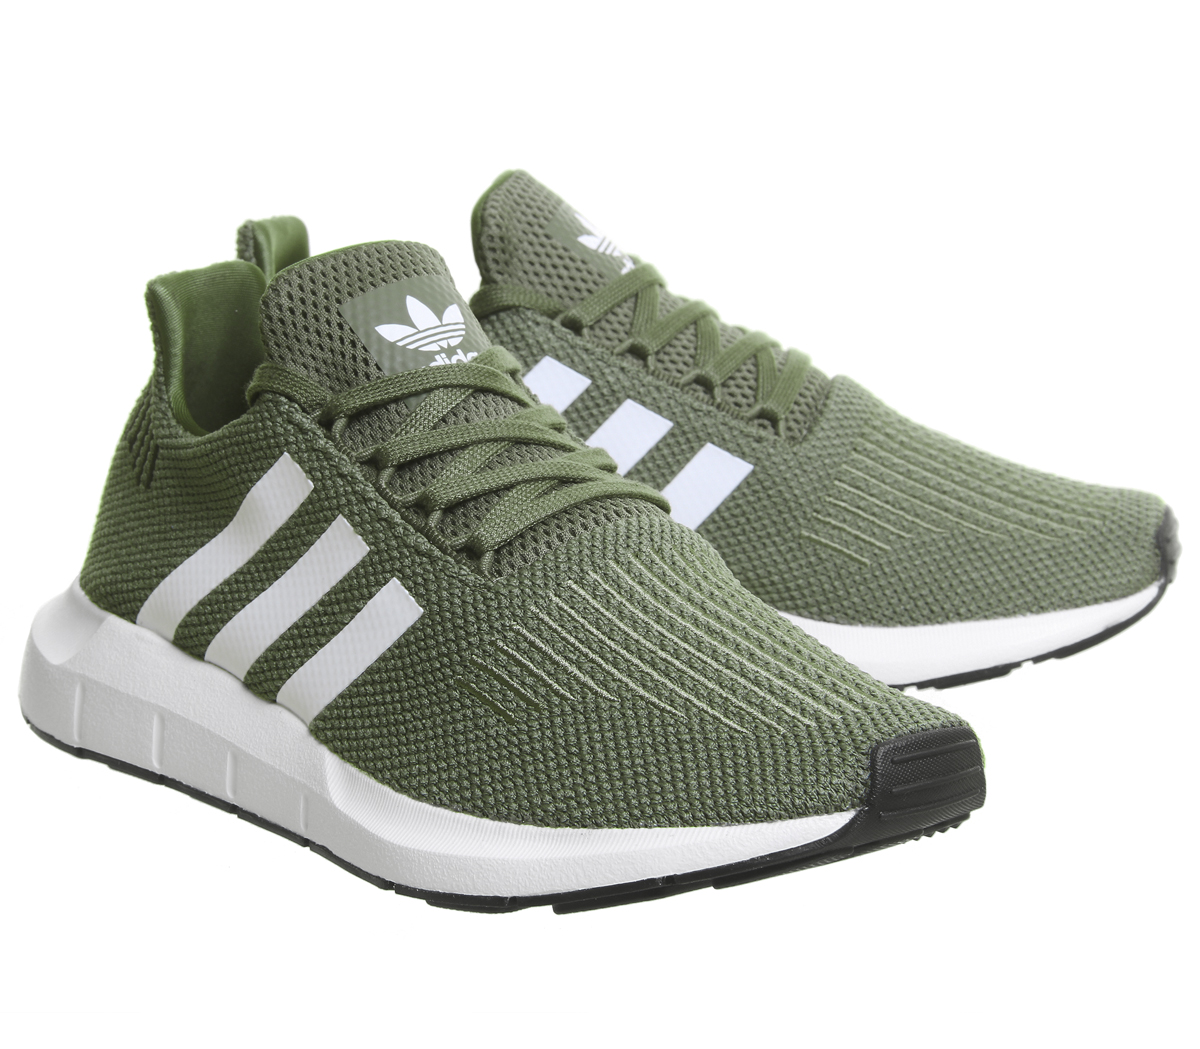 reputable site fce28 44e91 Da-Donna-Adidas-Swift-Run-Scarpe-Da-Ginnastica-